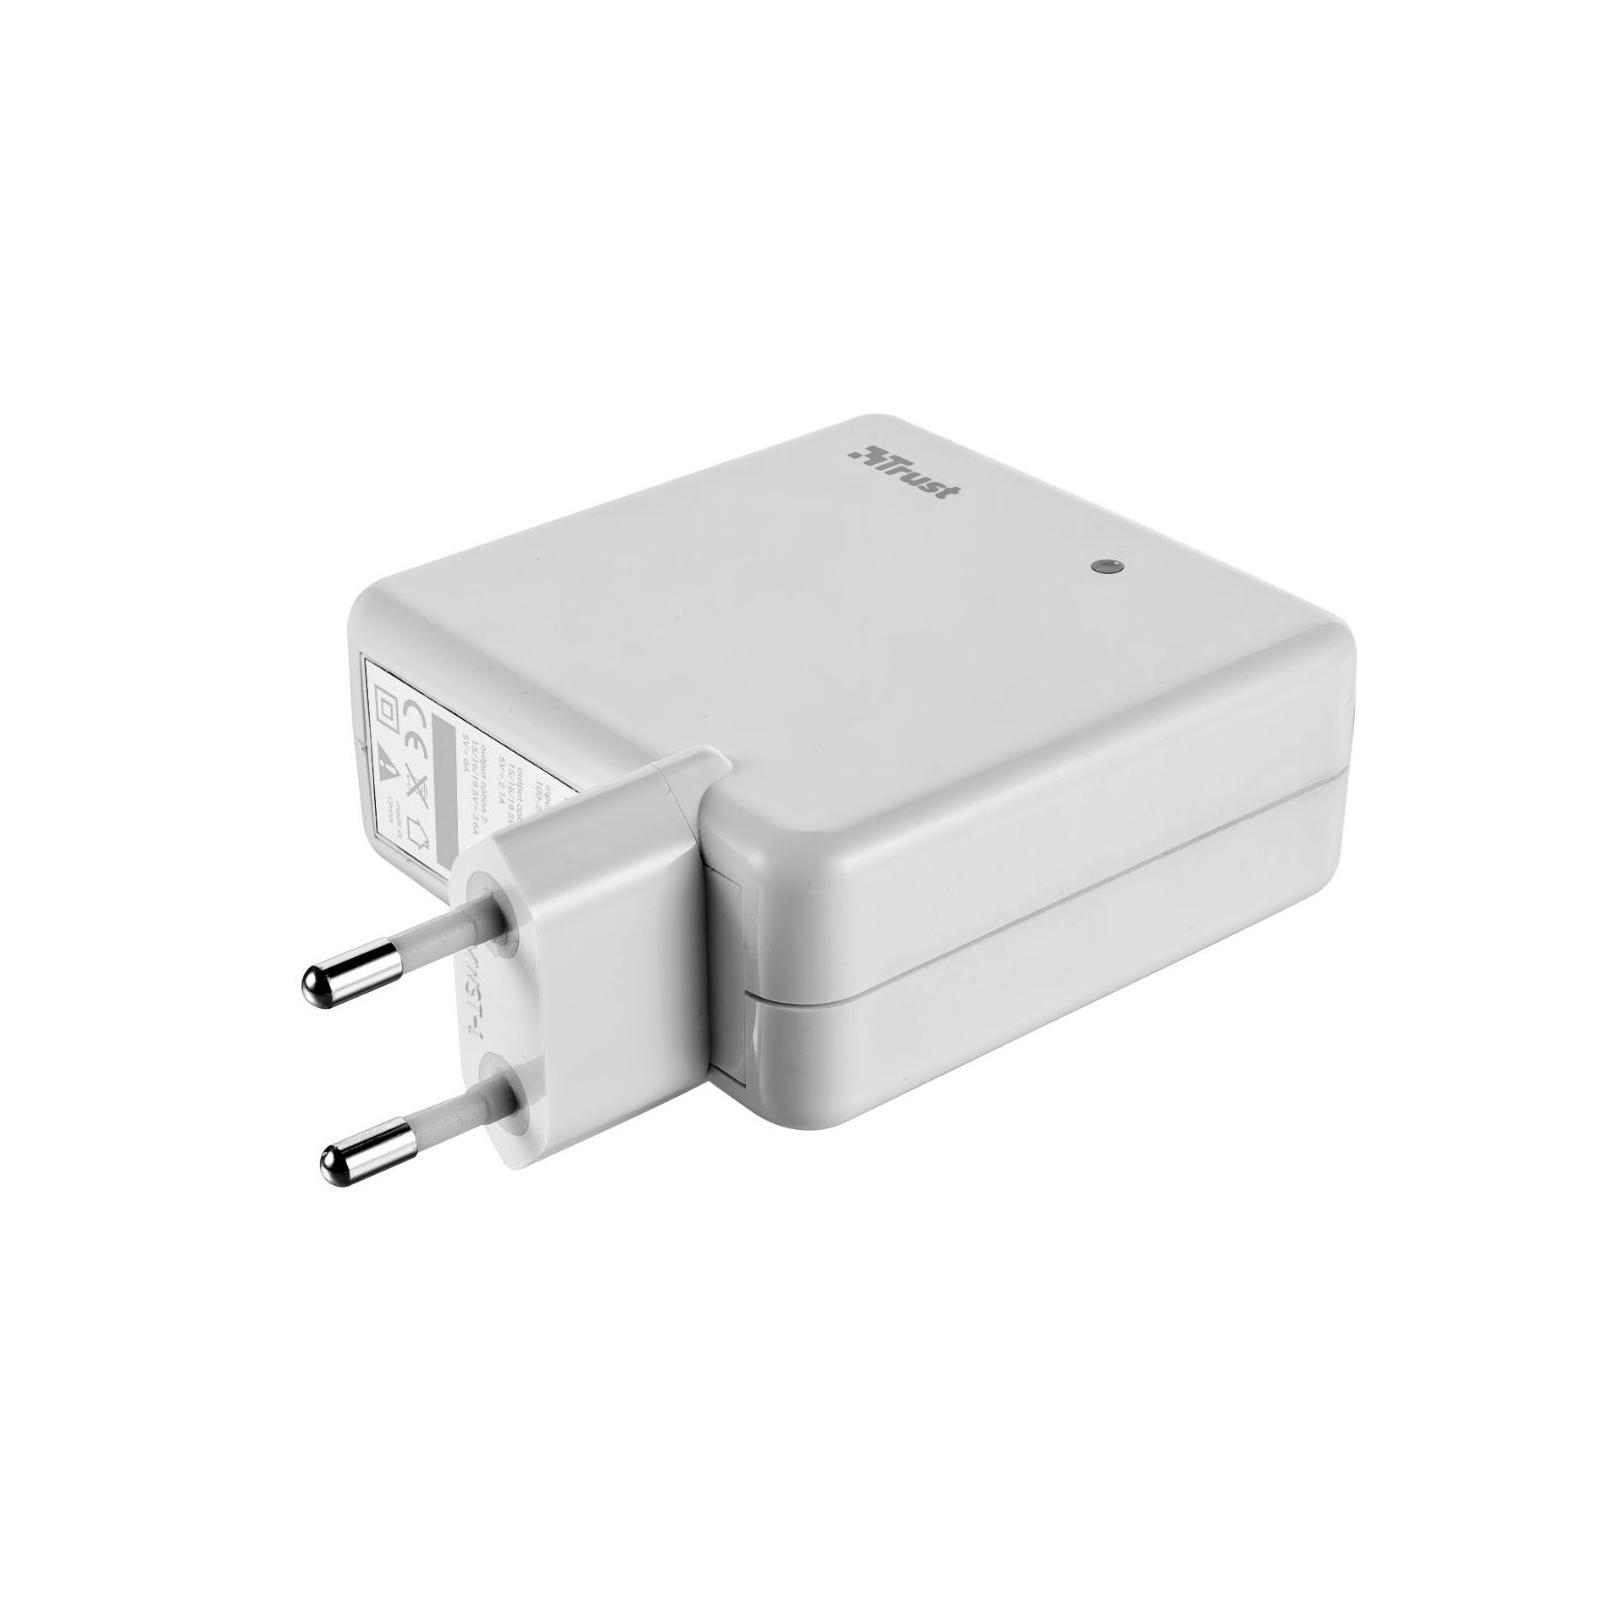 Блок питания к ноутбуку Trust Plug-in 70W Laptop, phone & iPad charger (18821) изображение 2